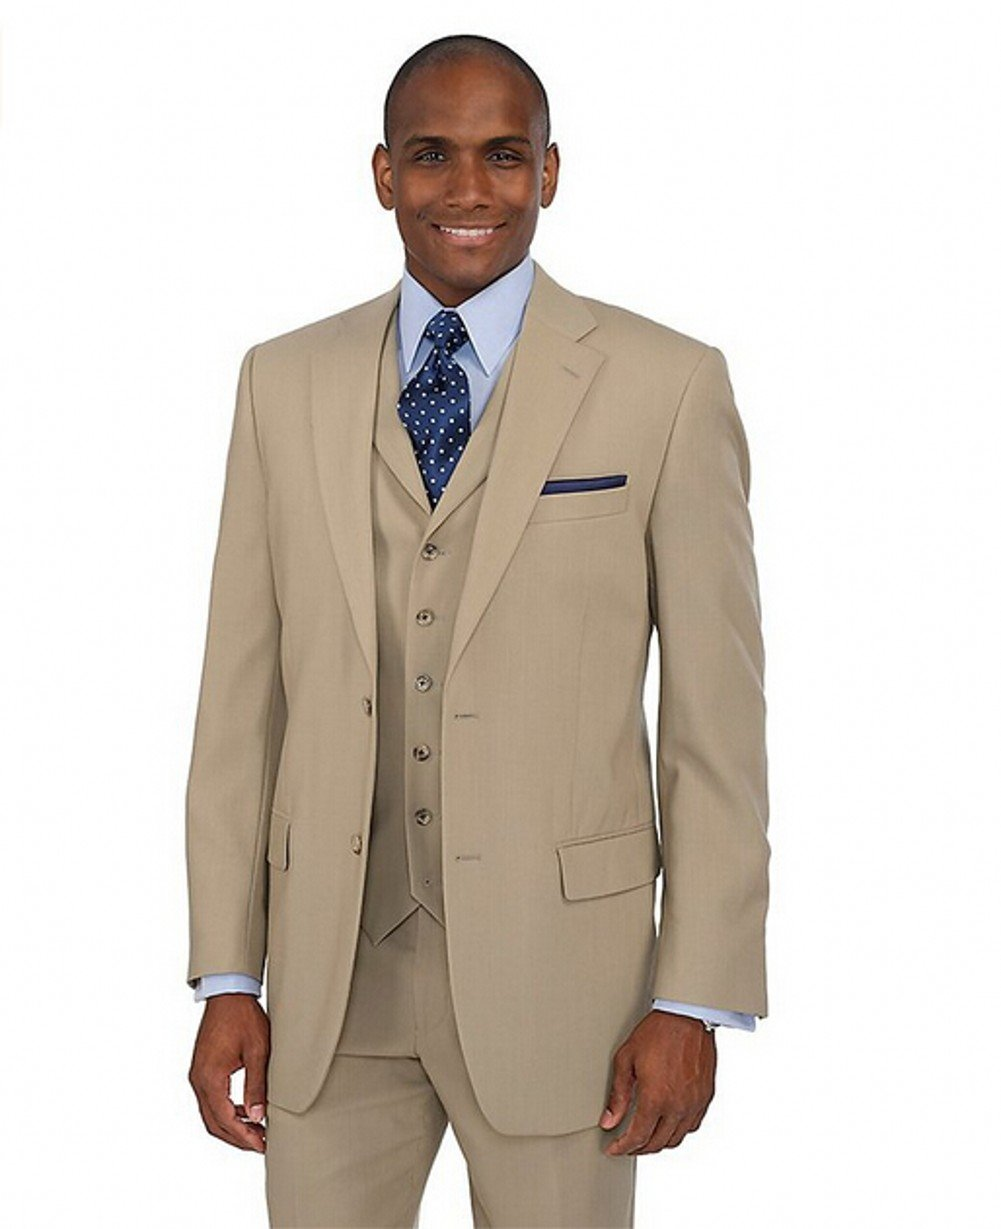 Love Dress Men's Two-Button Notch Lapel Suit Wedding Dress Tan 5XL